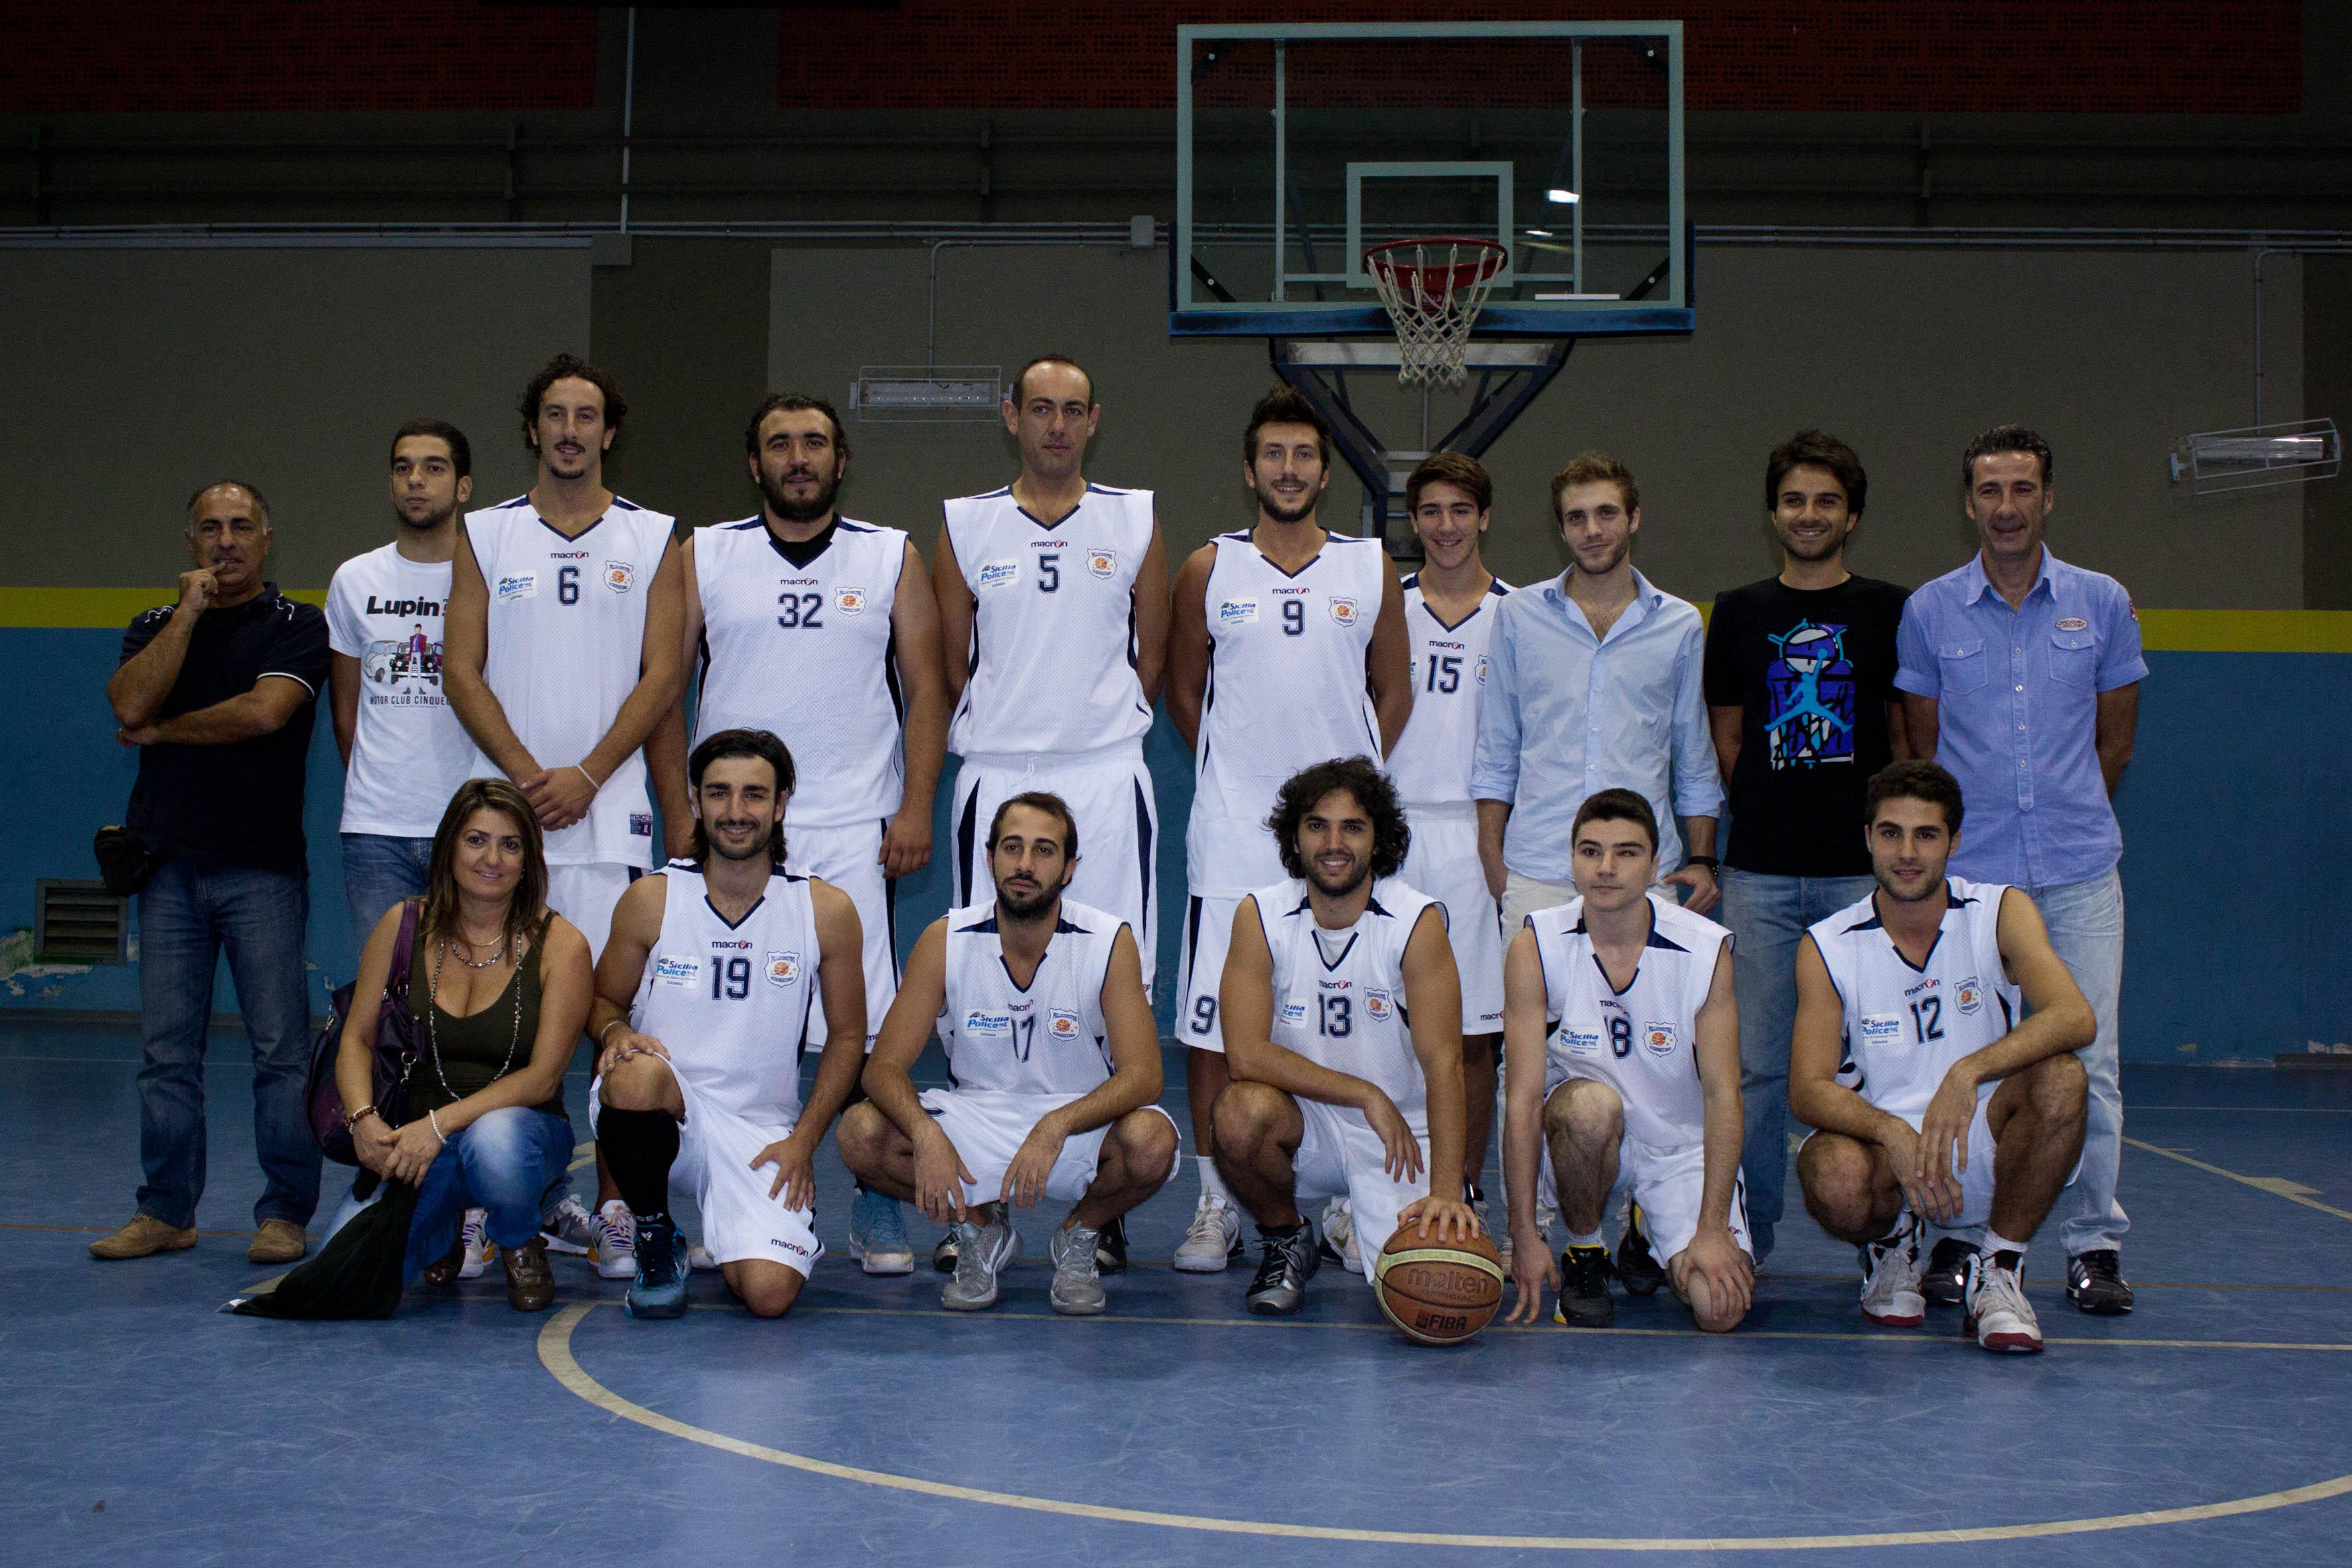 L'Aci Bonaccorsi 2012-2013.